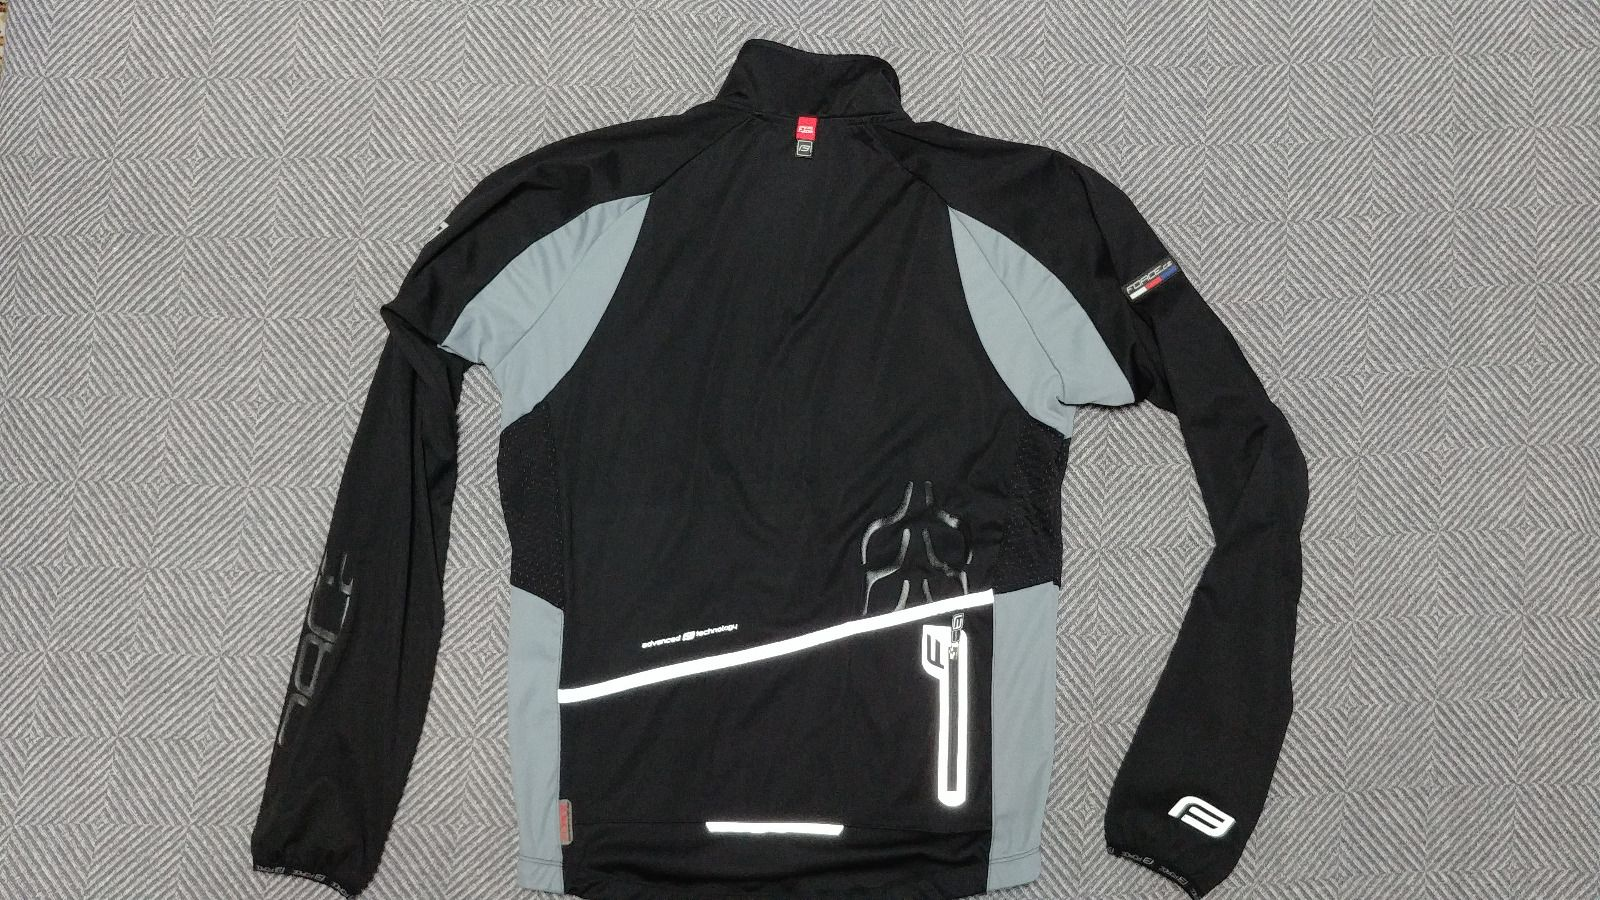 Велокуртка софтшелл, мужская, Force X80, размер М.